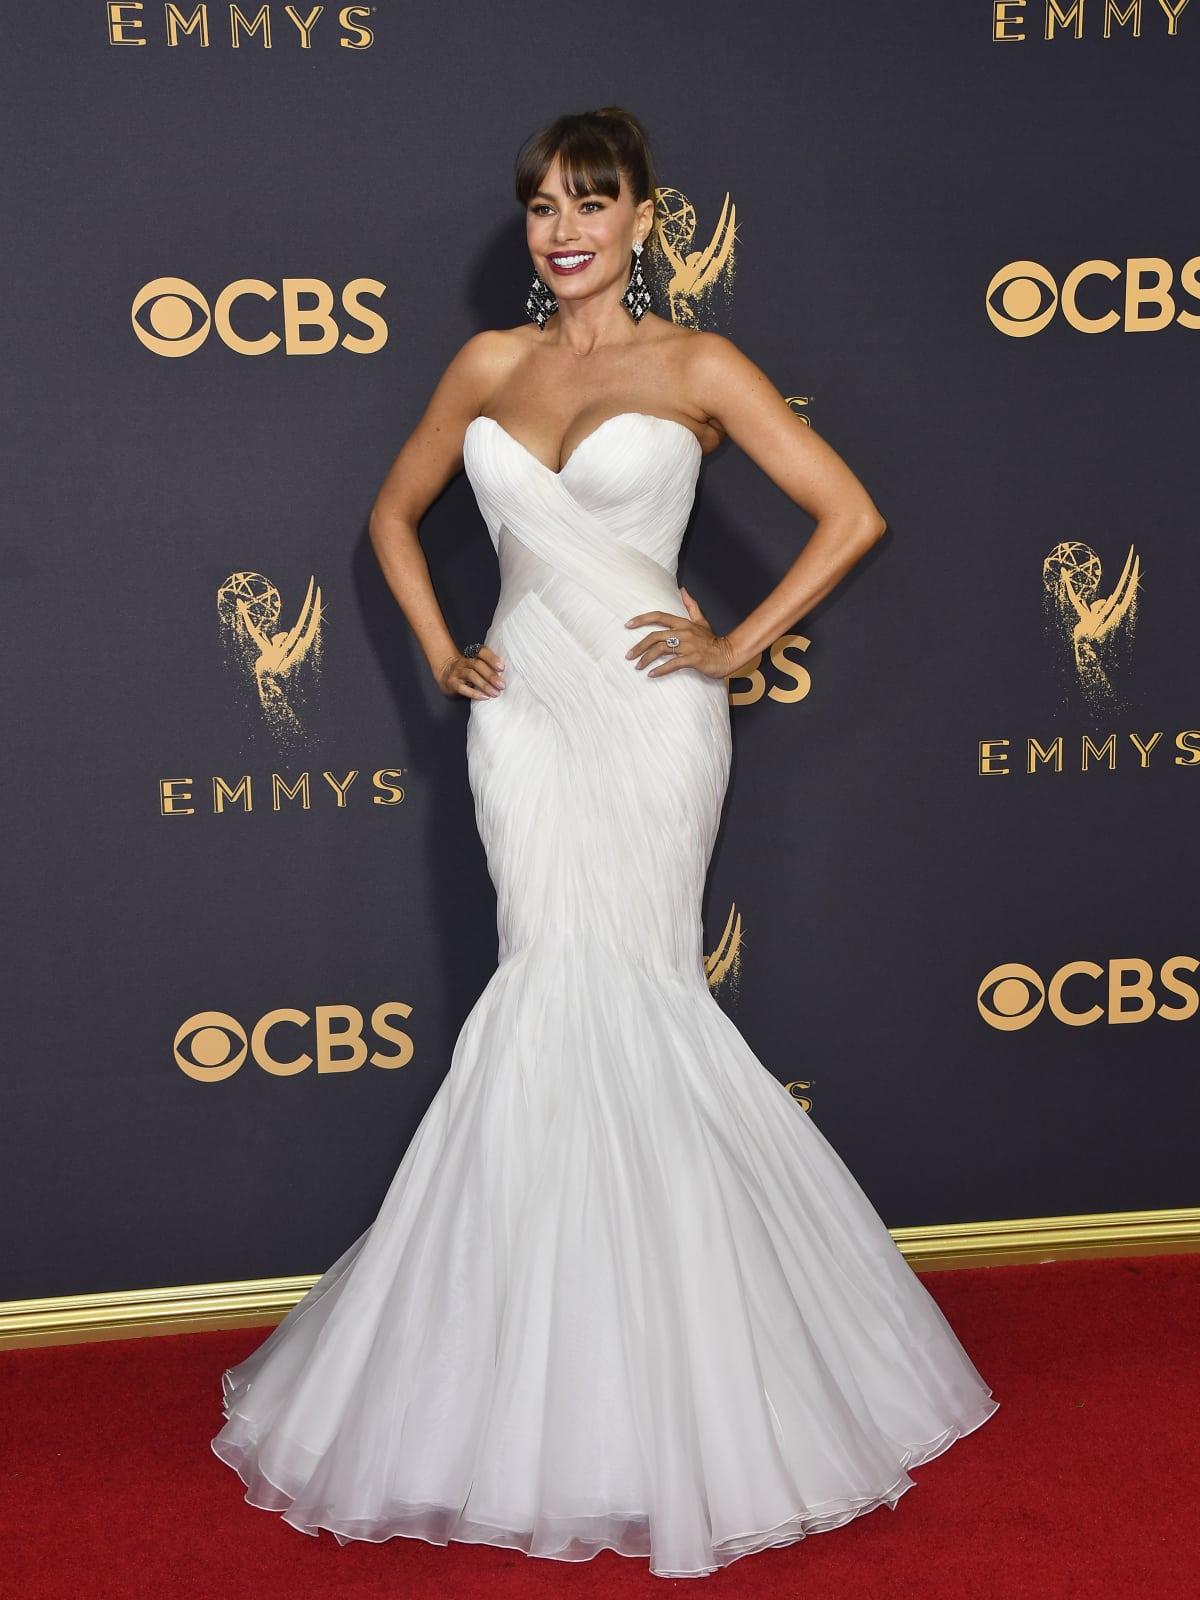 Sofia Vergara in a Marc Zunino gown at Emmy Awards 2017